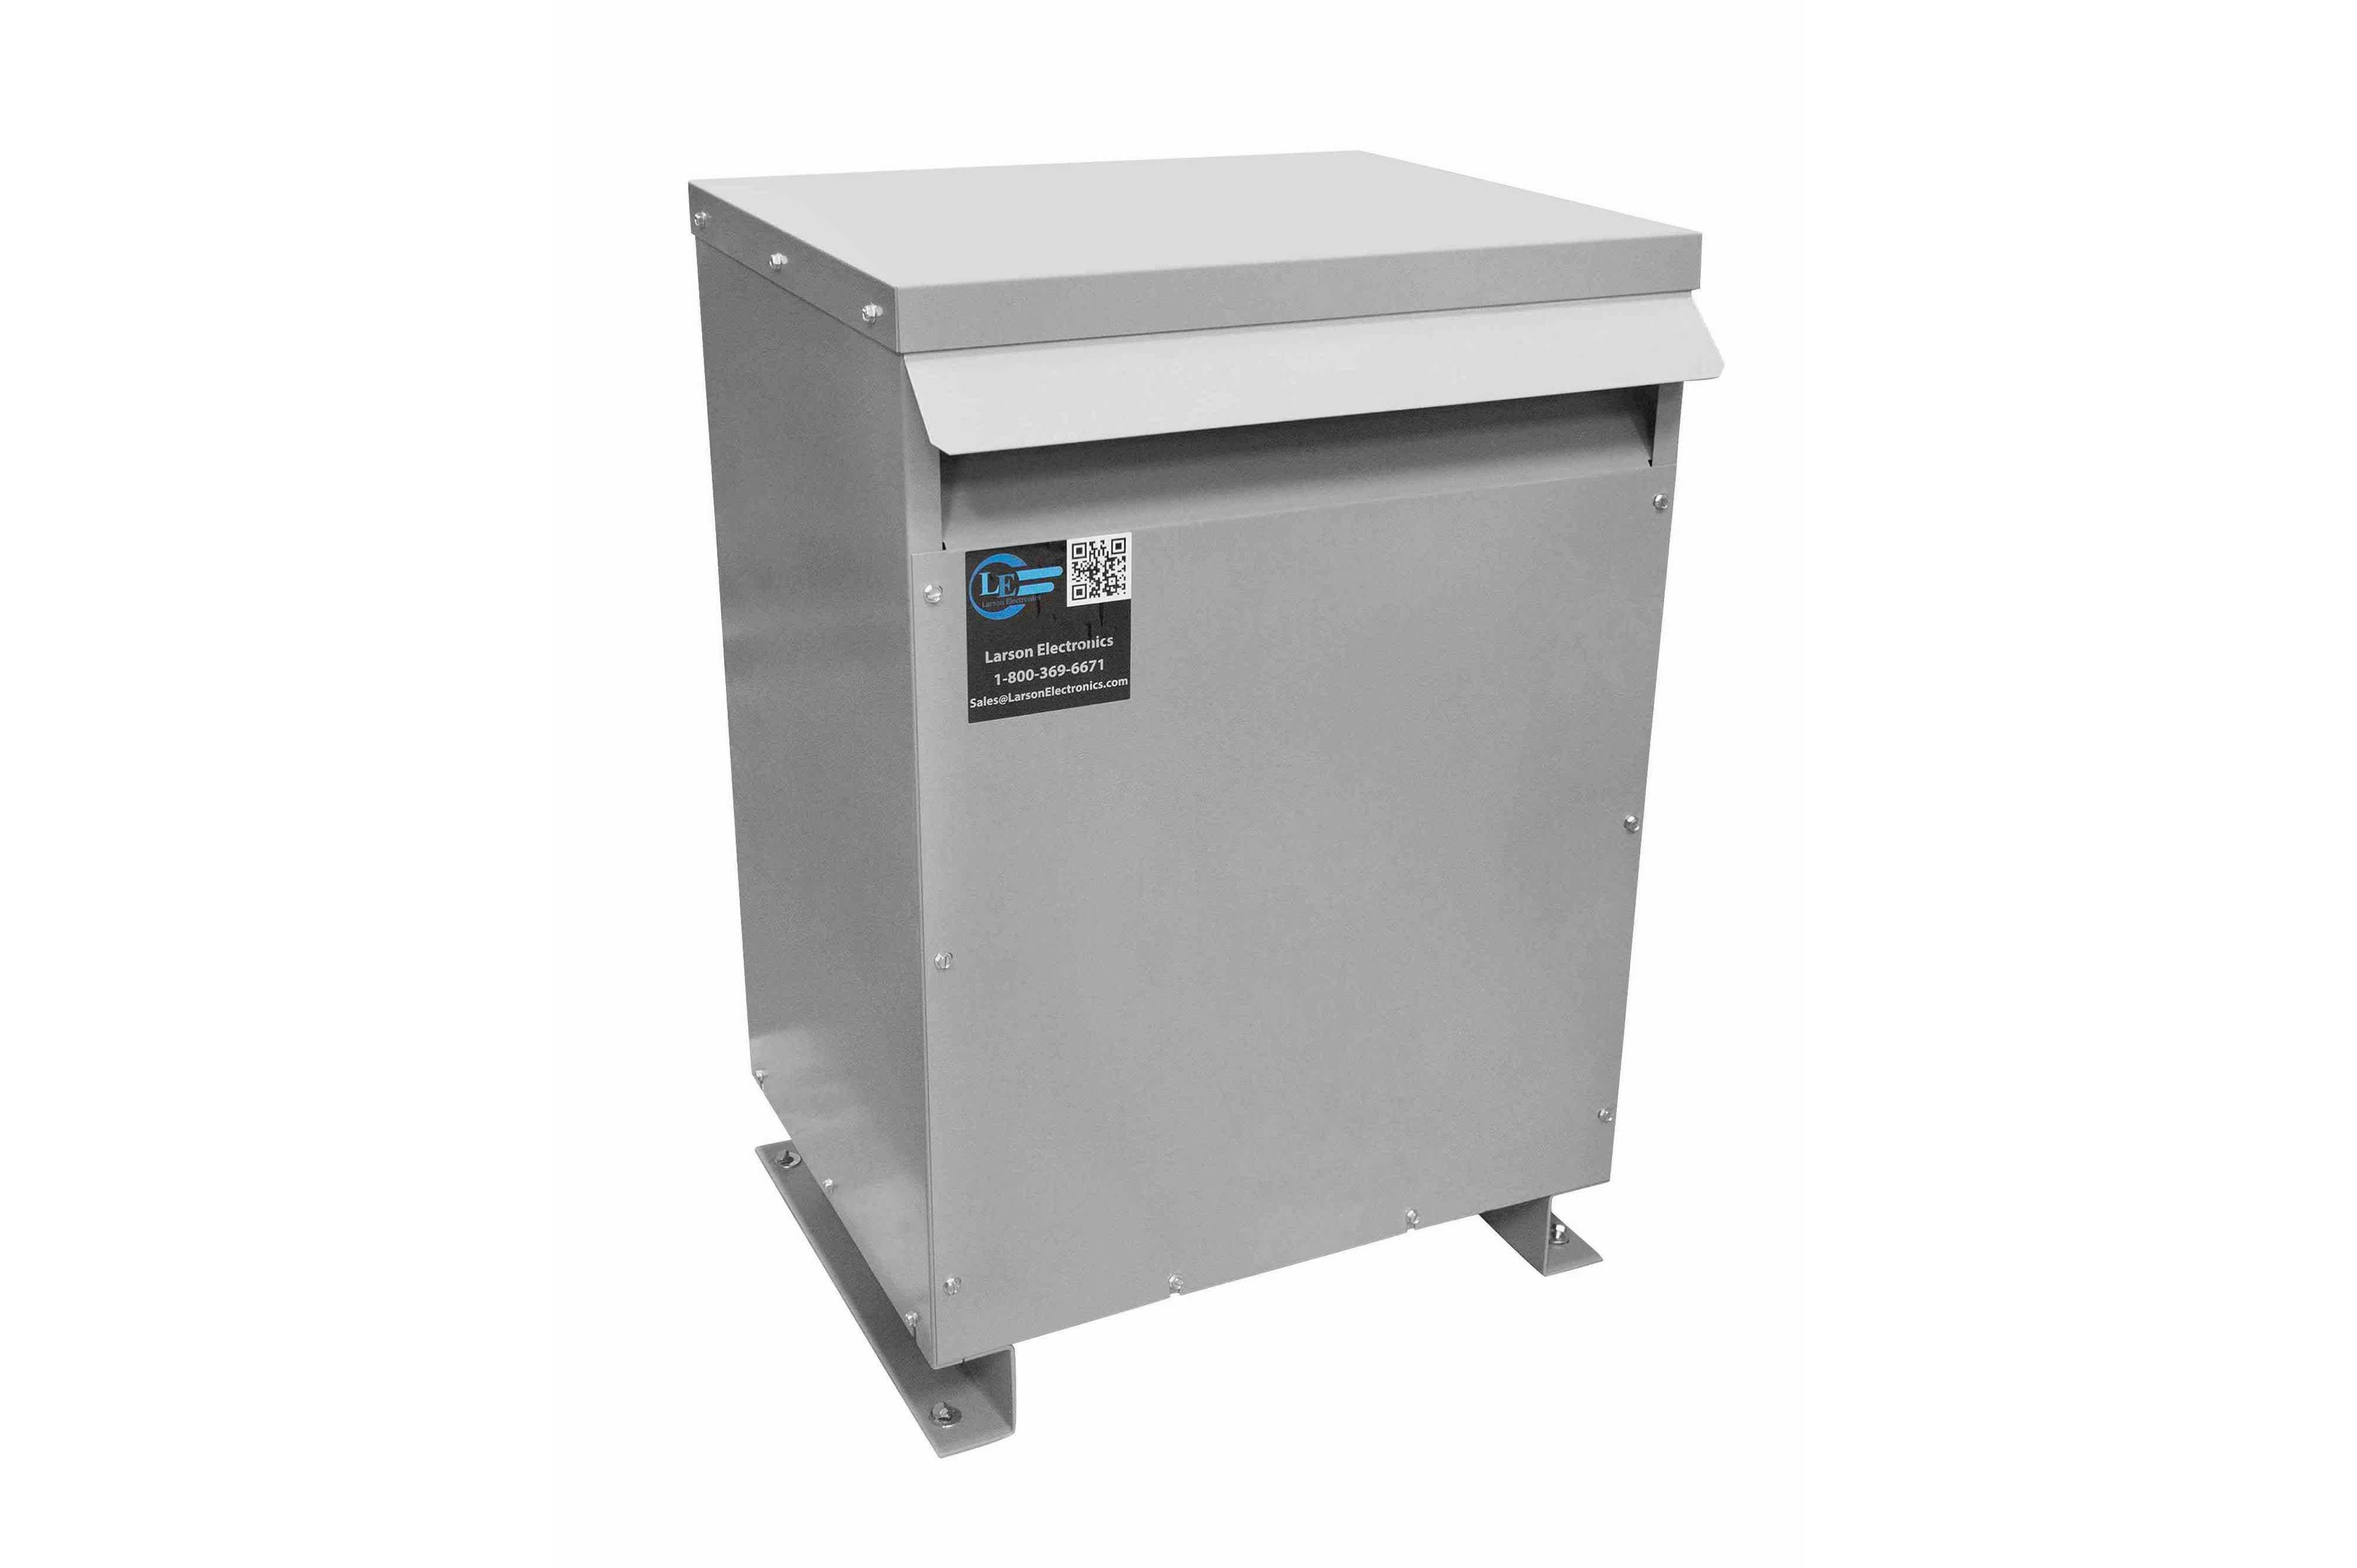 13 kVA 3PH Isolation Transformer, 460V Wye Primary, 575Y/332 Wye-N Secondary, N3R, Ventilated, 60 Hz